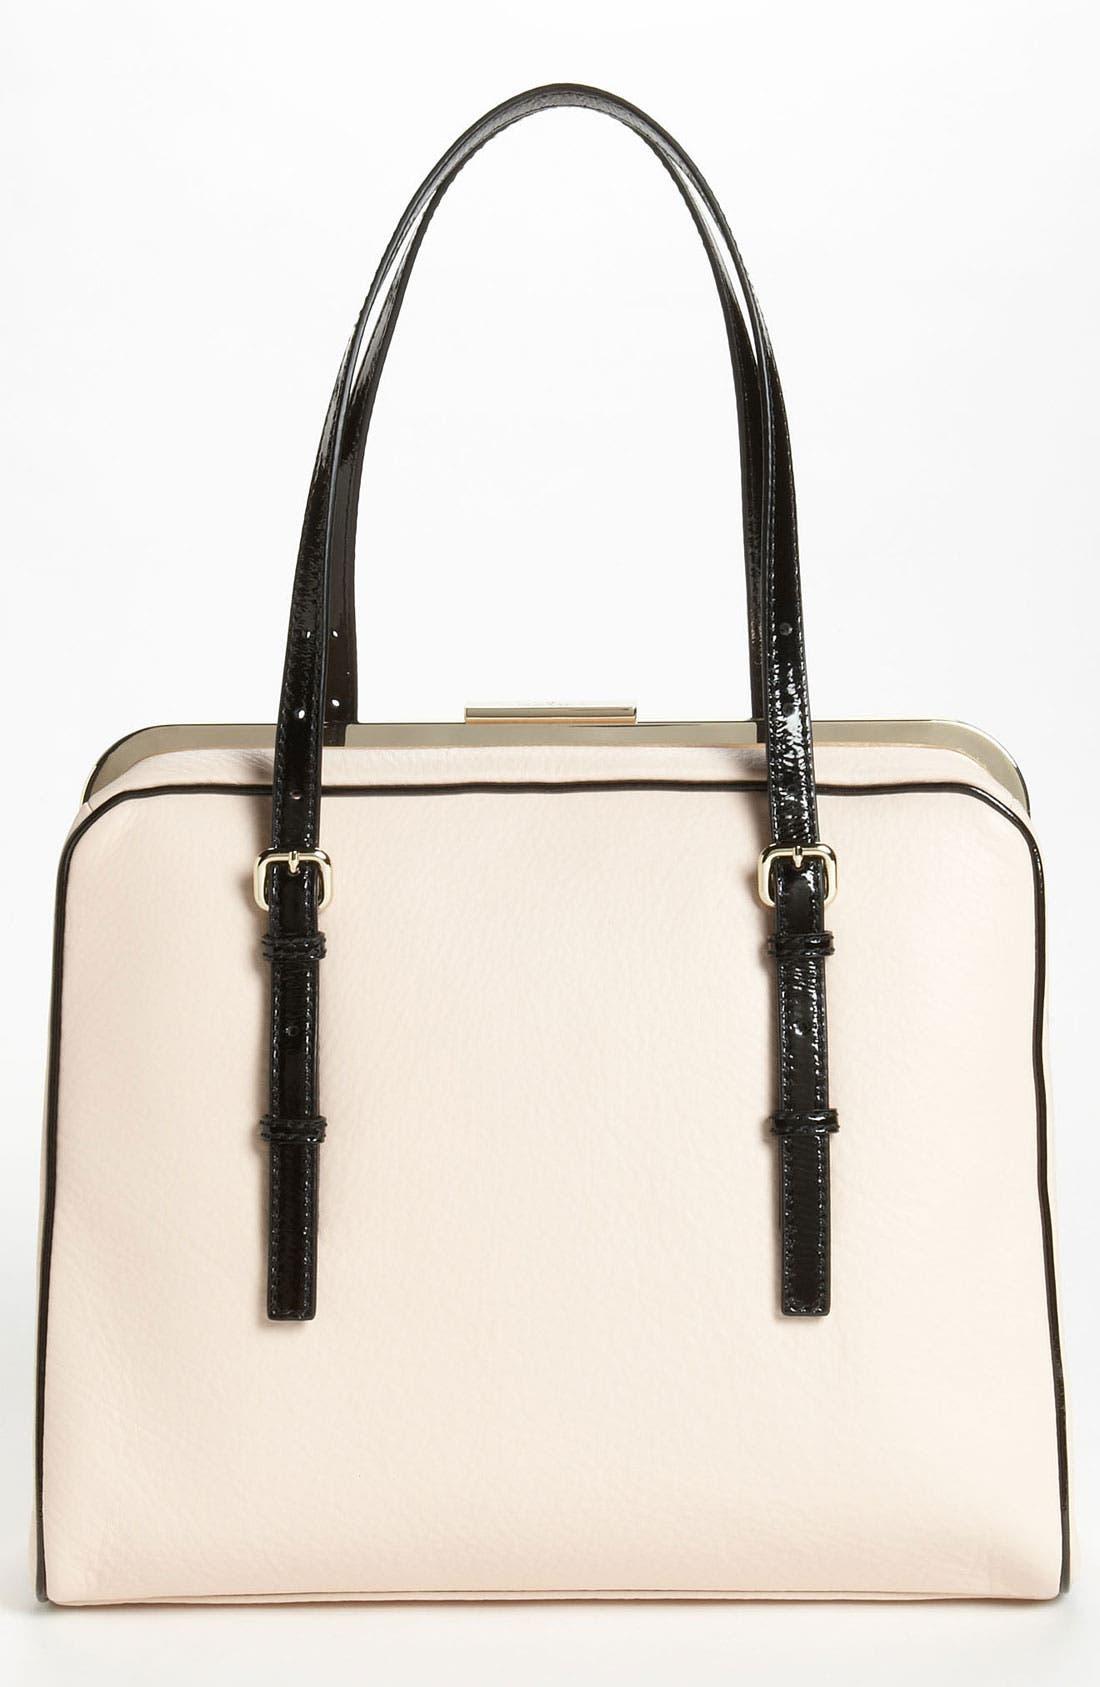 Main Image - kate spade new york 'parker place - margie' handbag